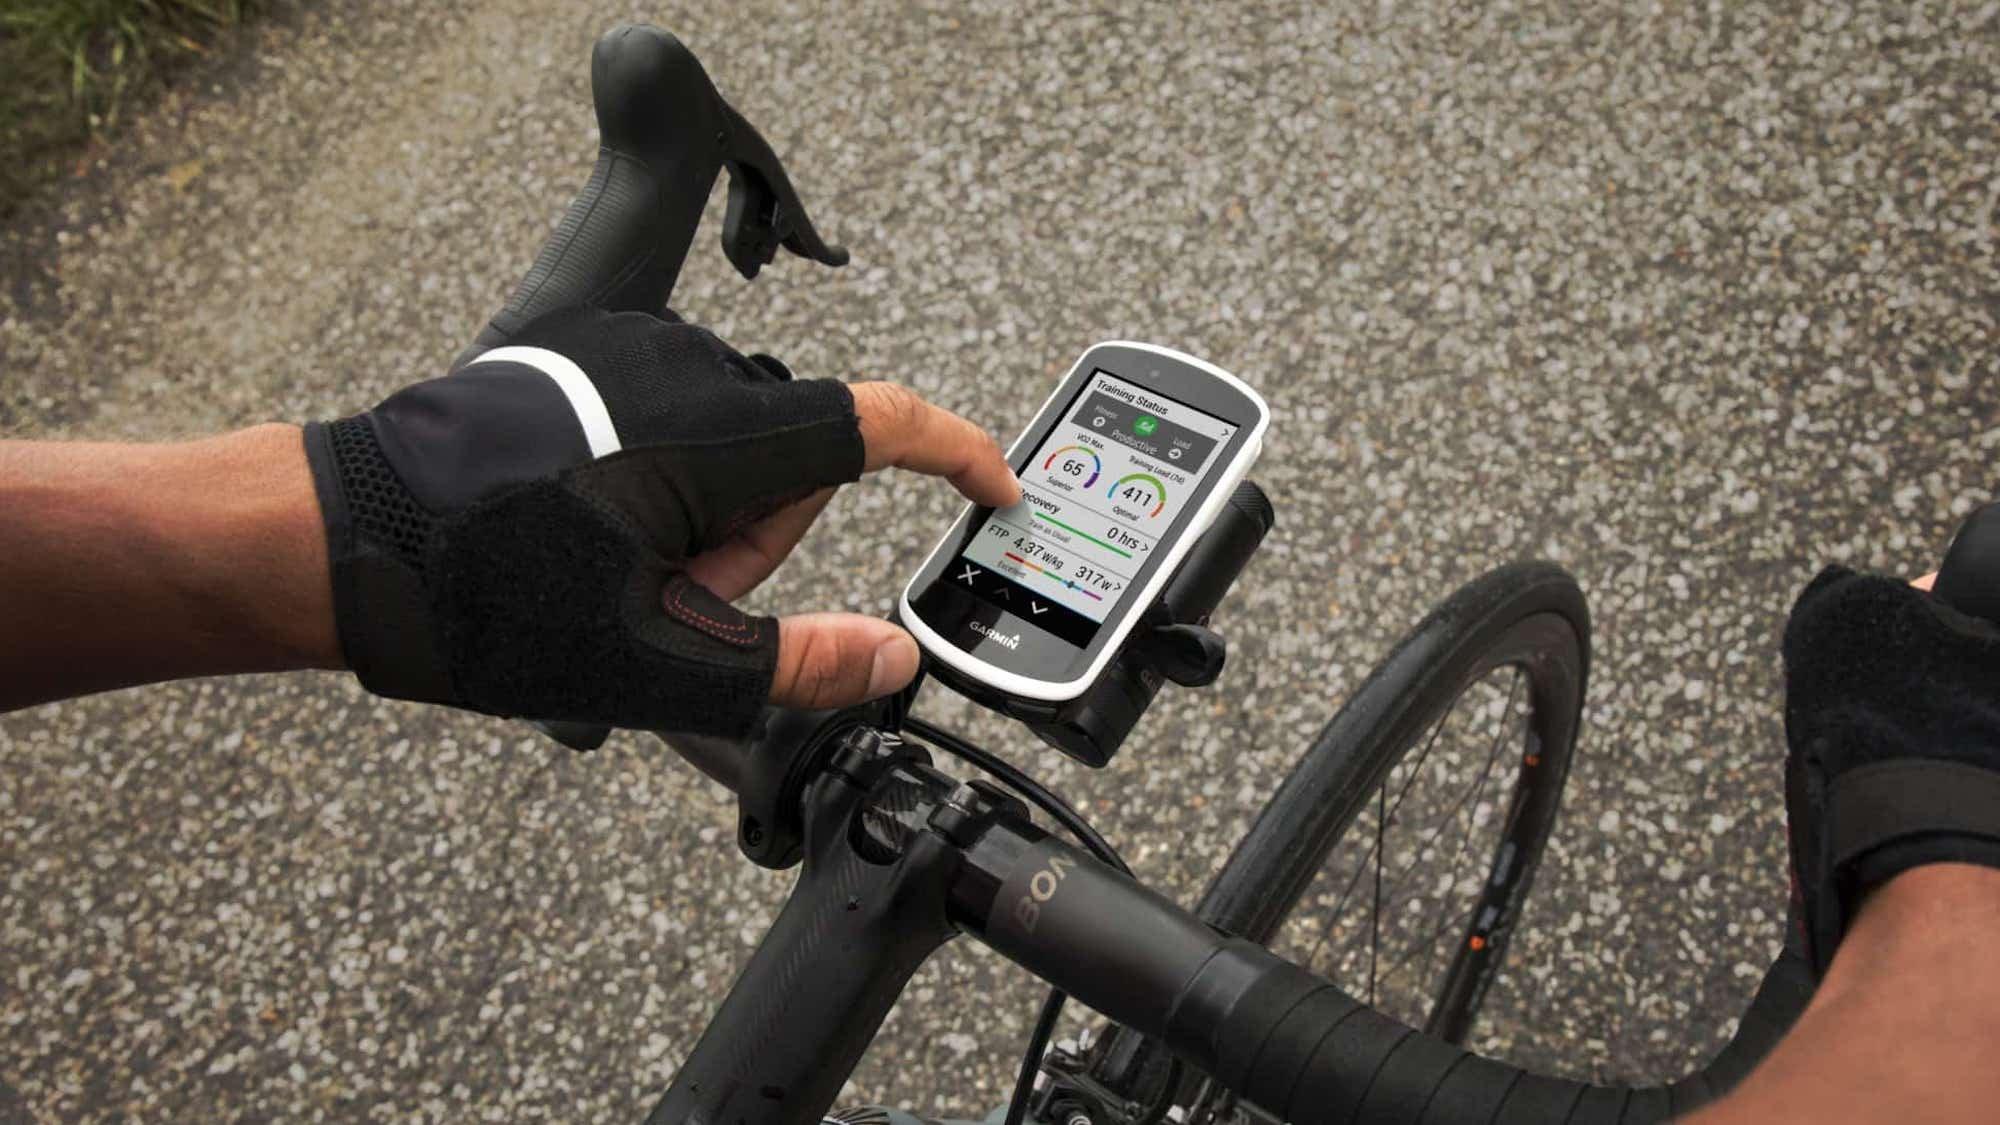 Garmin Edge 1030 Plus GPS bike computer will work great on your favorite remote trails